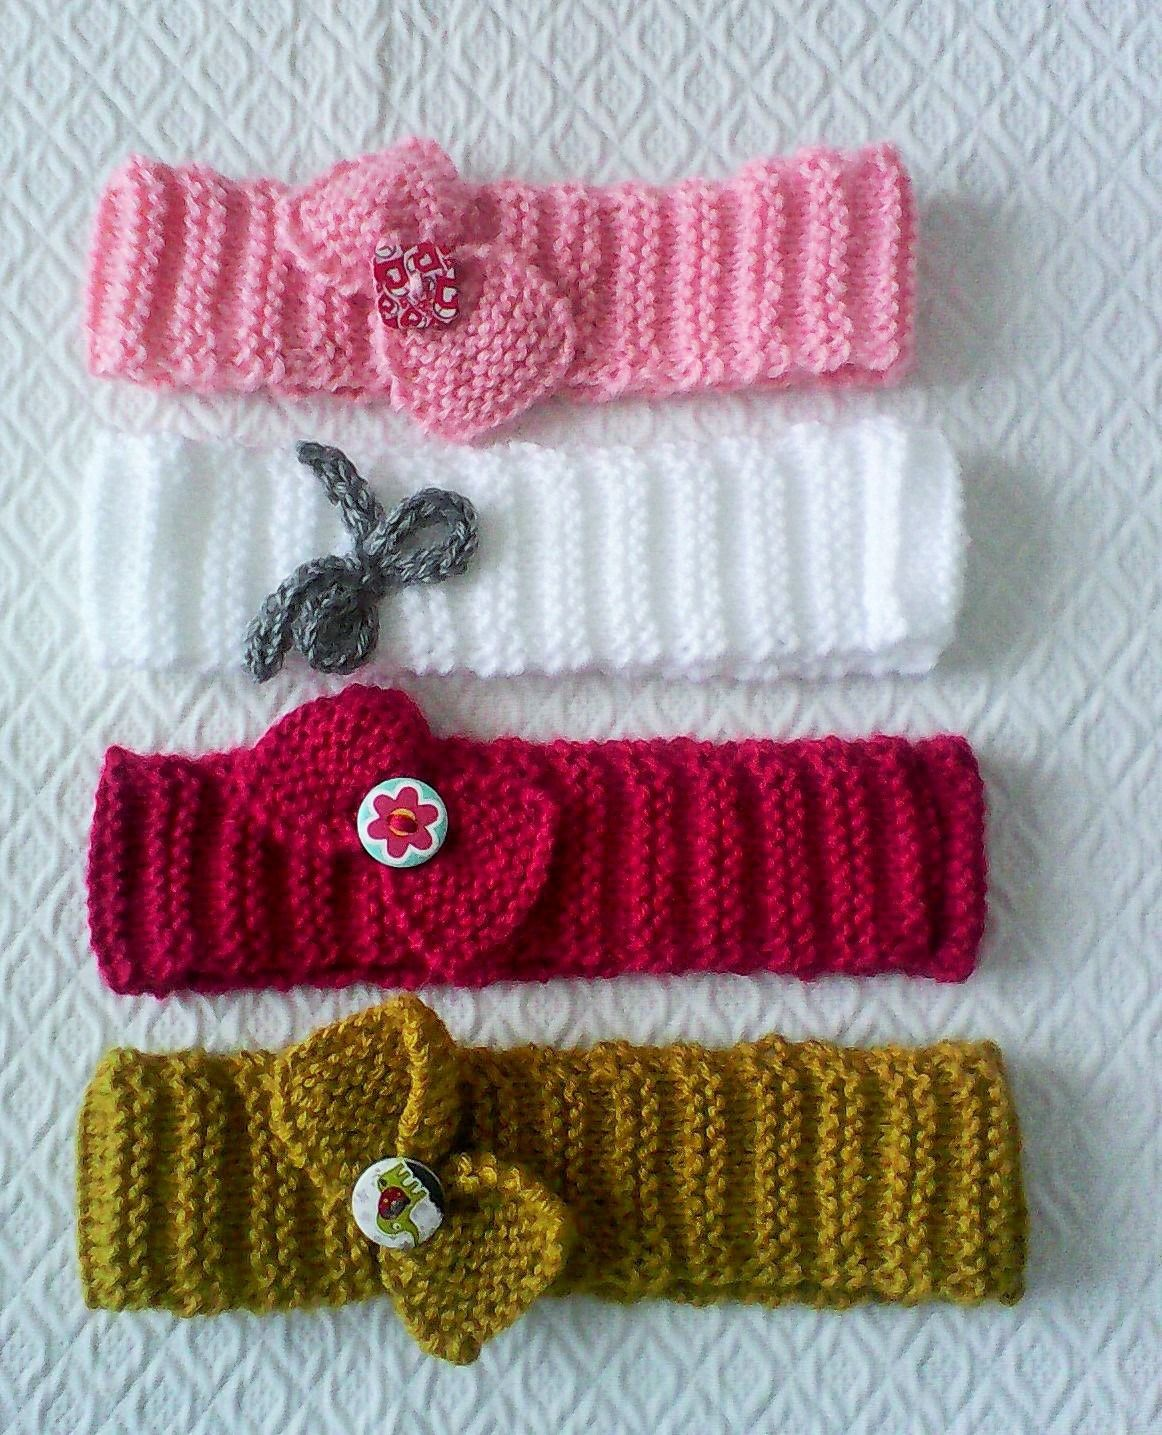 bandeau fille tricot main rose avec noeud fix par bouton rose et blanc en bois enfants. Black Bedroom Furniture Sets. Home Design Ideas